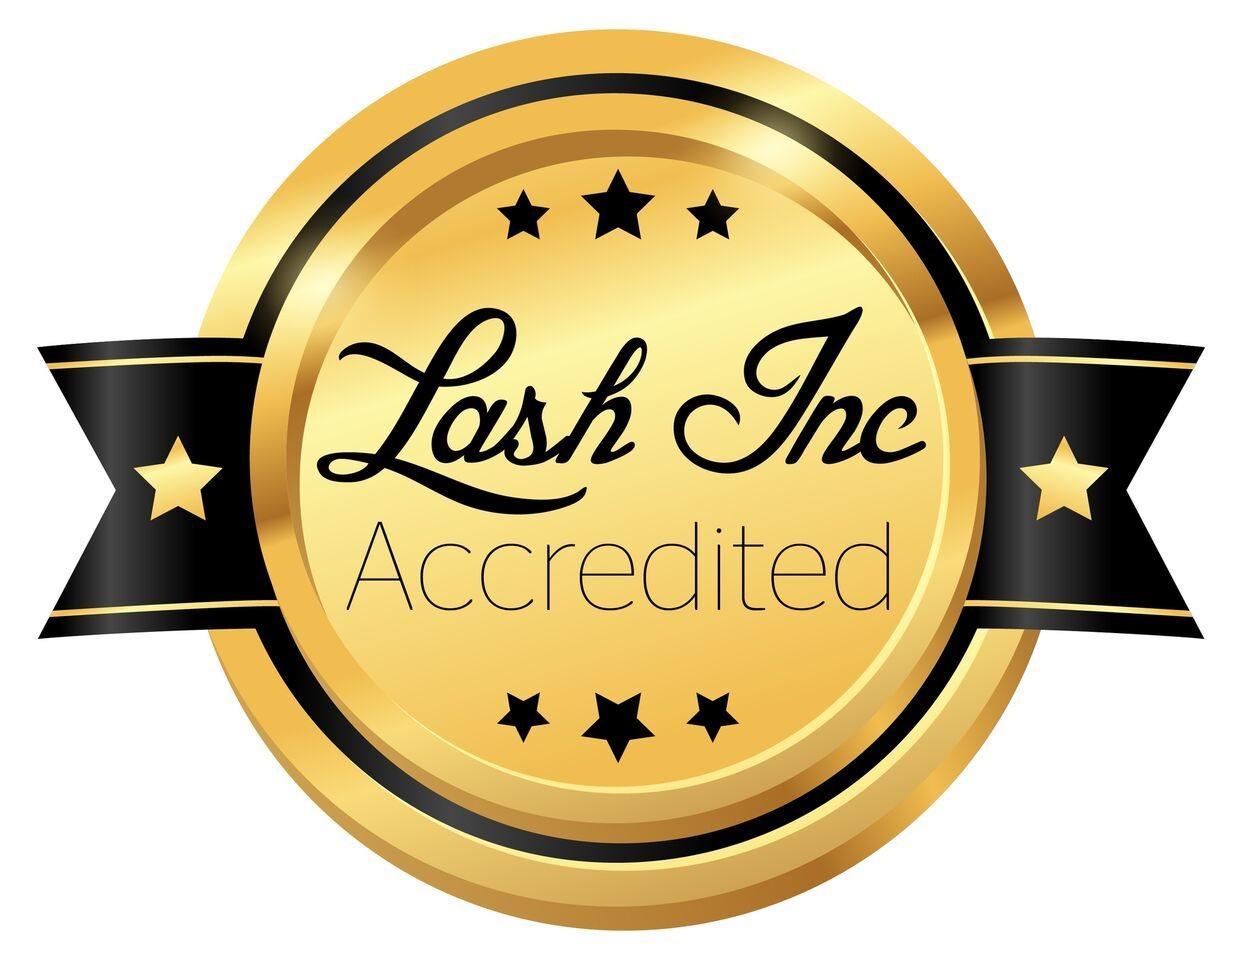 Lash Inc Multiple Course - Accreditation Renewal Fee